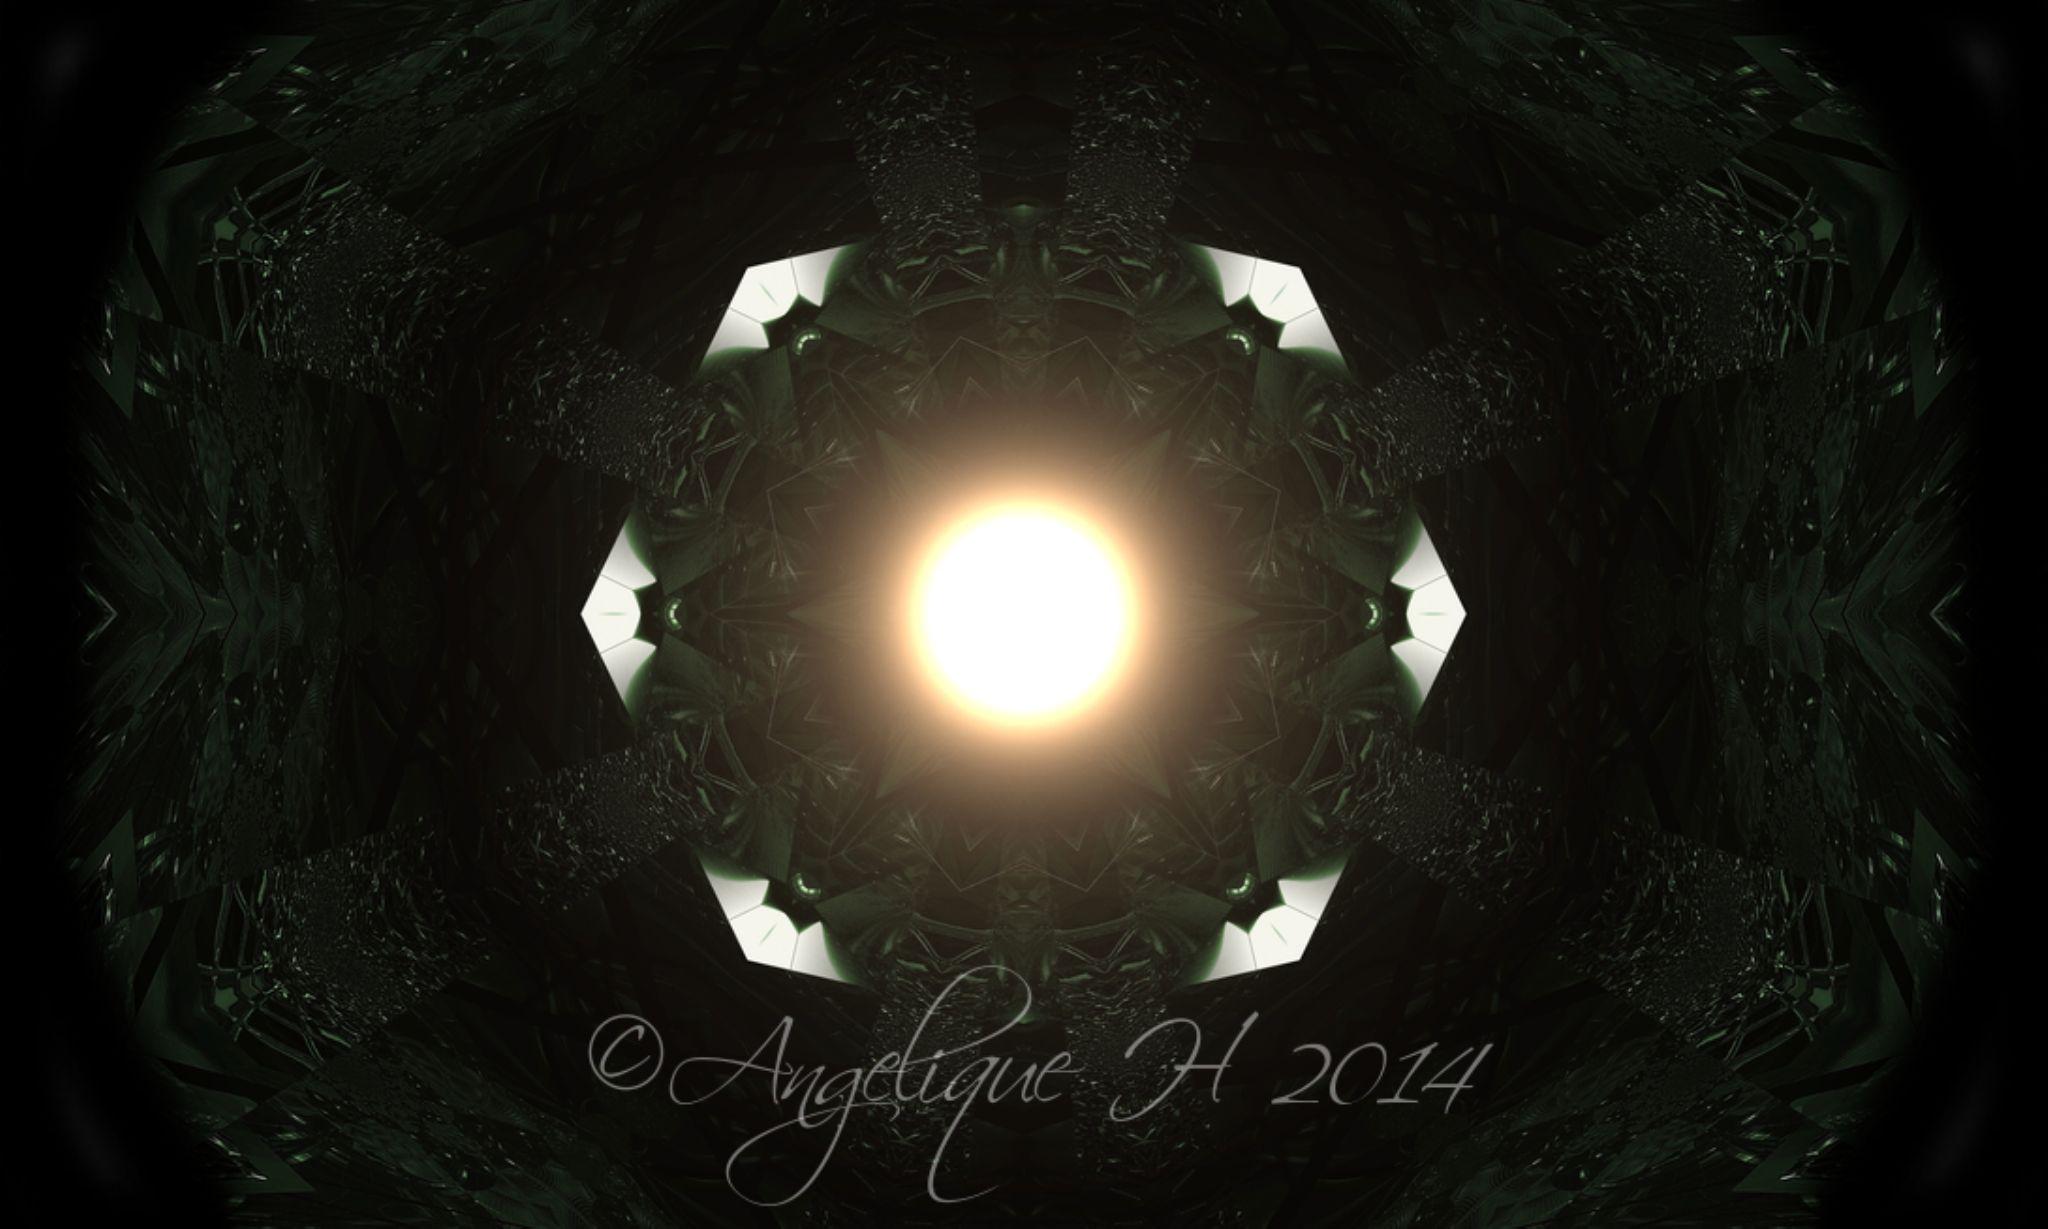 green black,15 layer mandala world, mirror, perscpective,starshine (2),kaleidoscope ,watermarked,wor by AngeliqueH